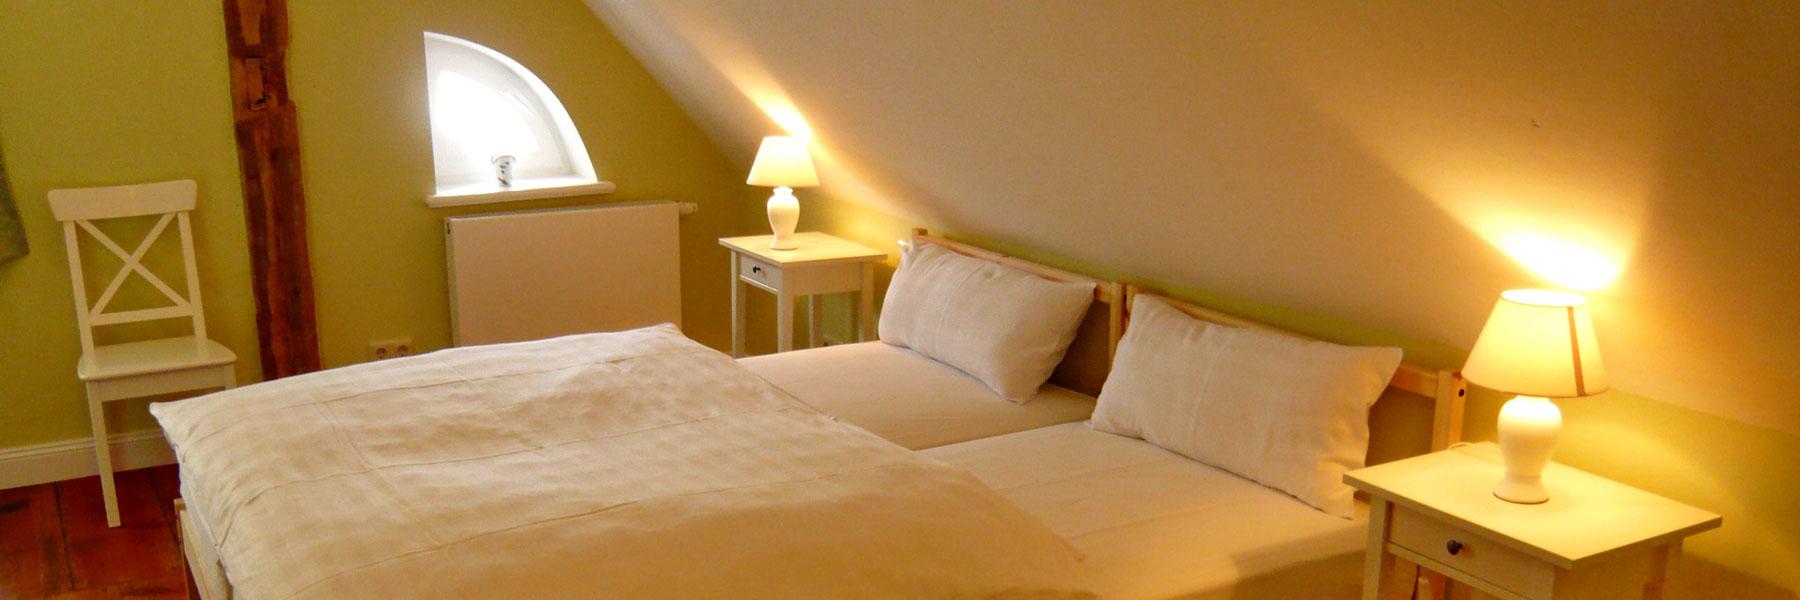 schloss schlafzimmer bettdecken origami star wars bettw sche real peter pan bayern m nchen. Black Bedroom Furniture Sets. Home Design Ideas